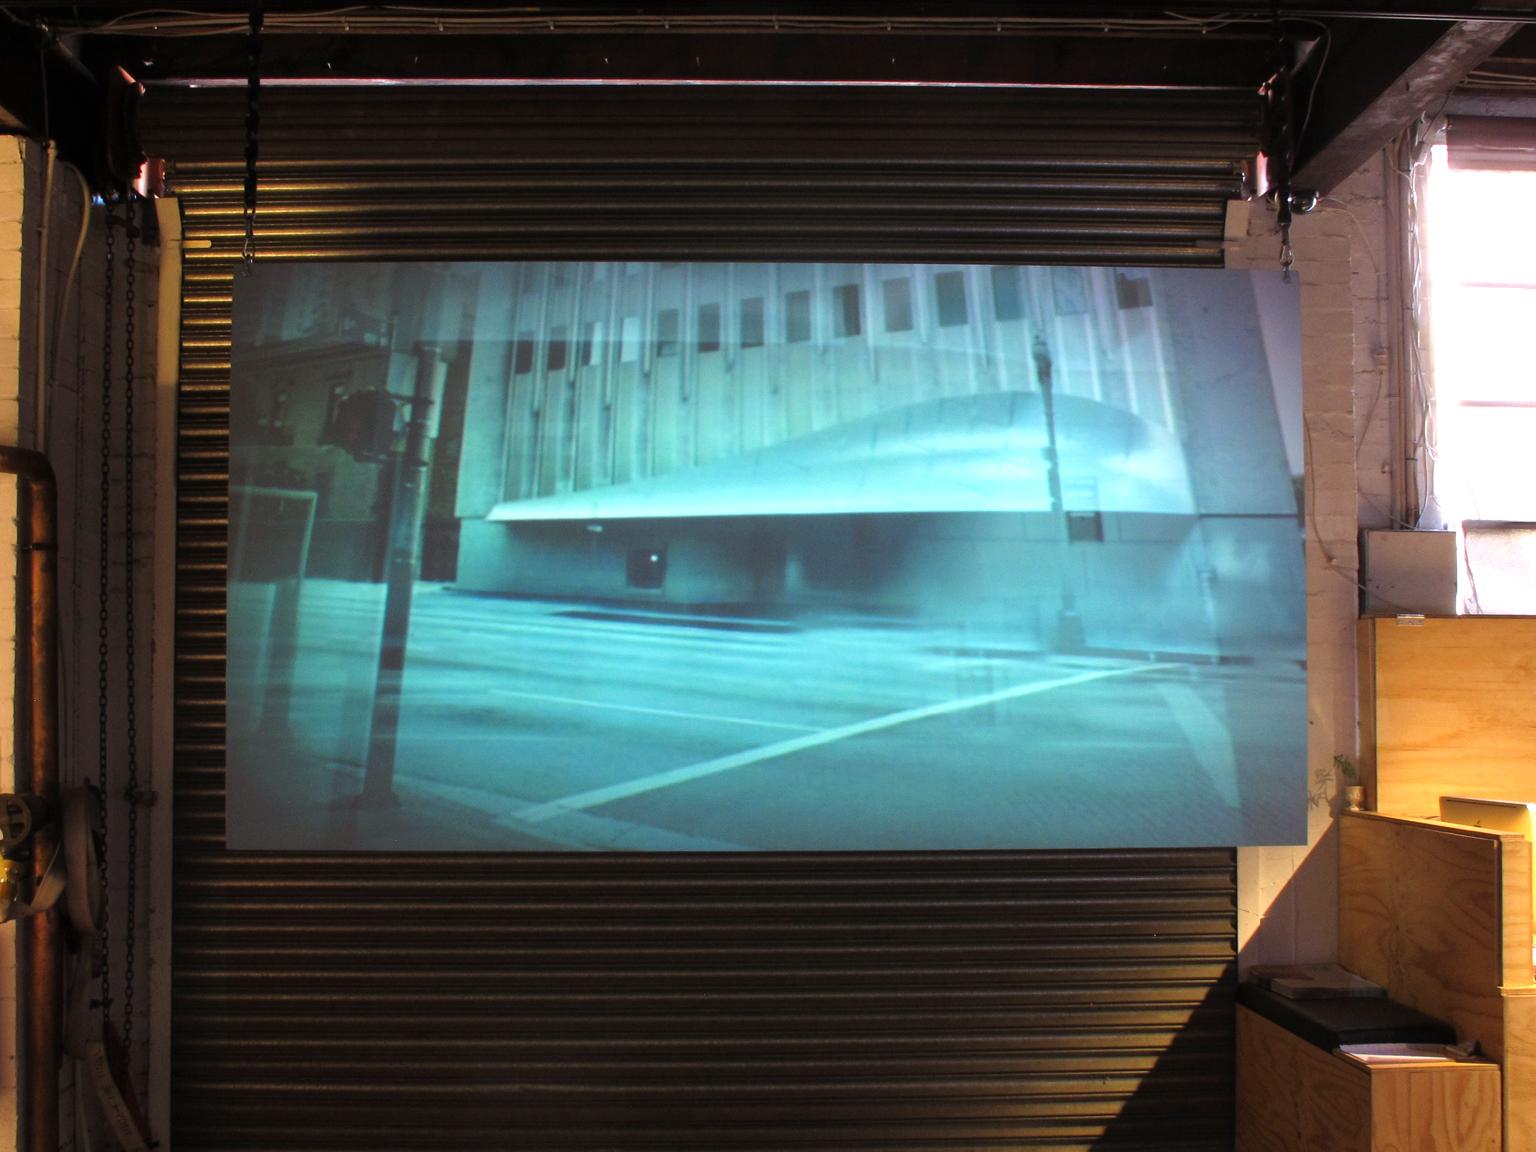 Zach Nader, Optional Features Shown, 2012, Digital Video, 2.10sec